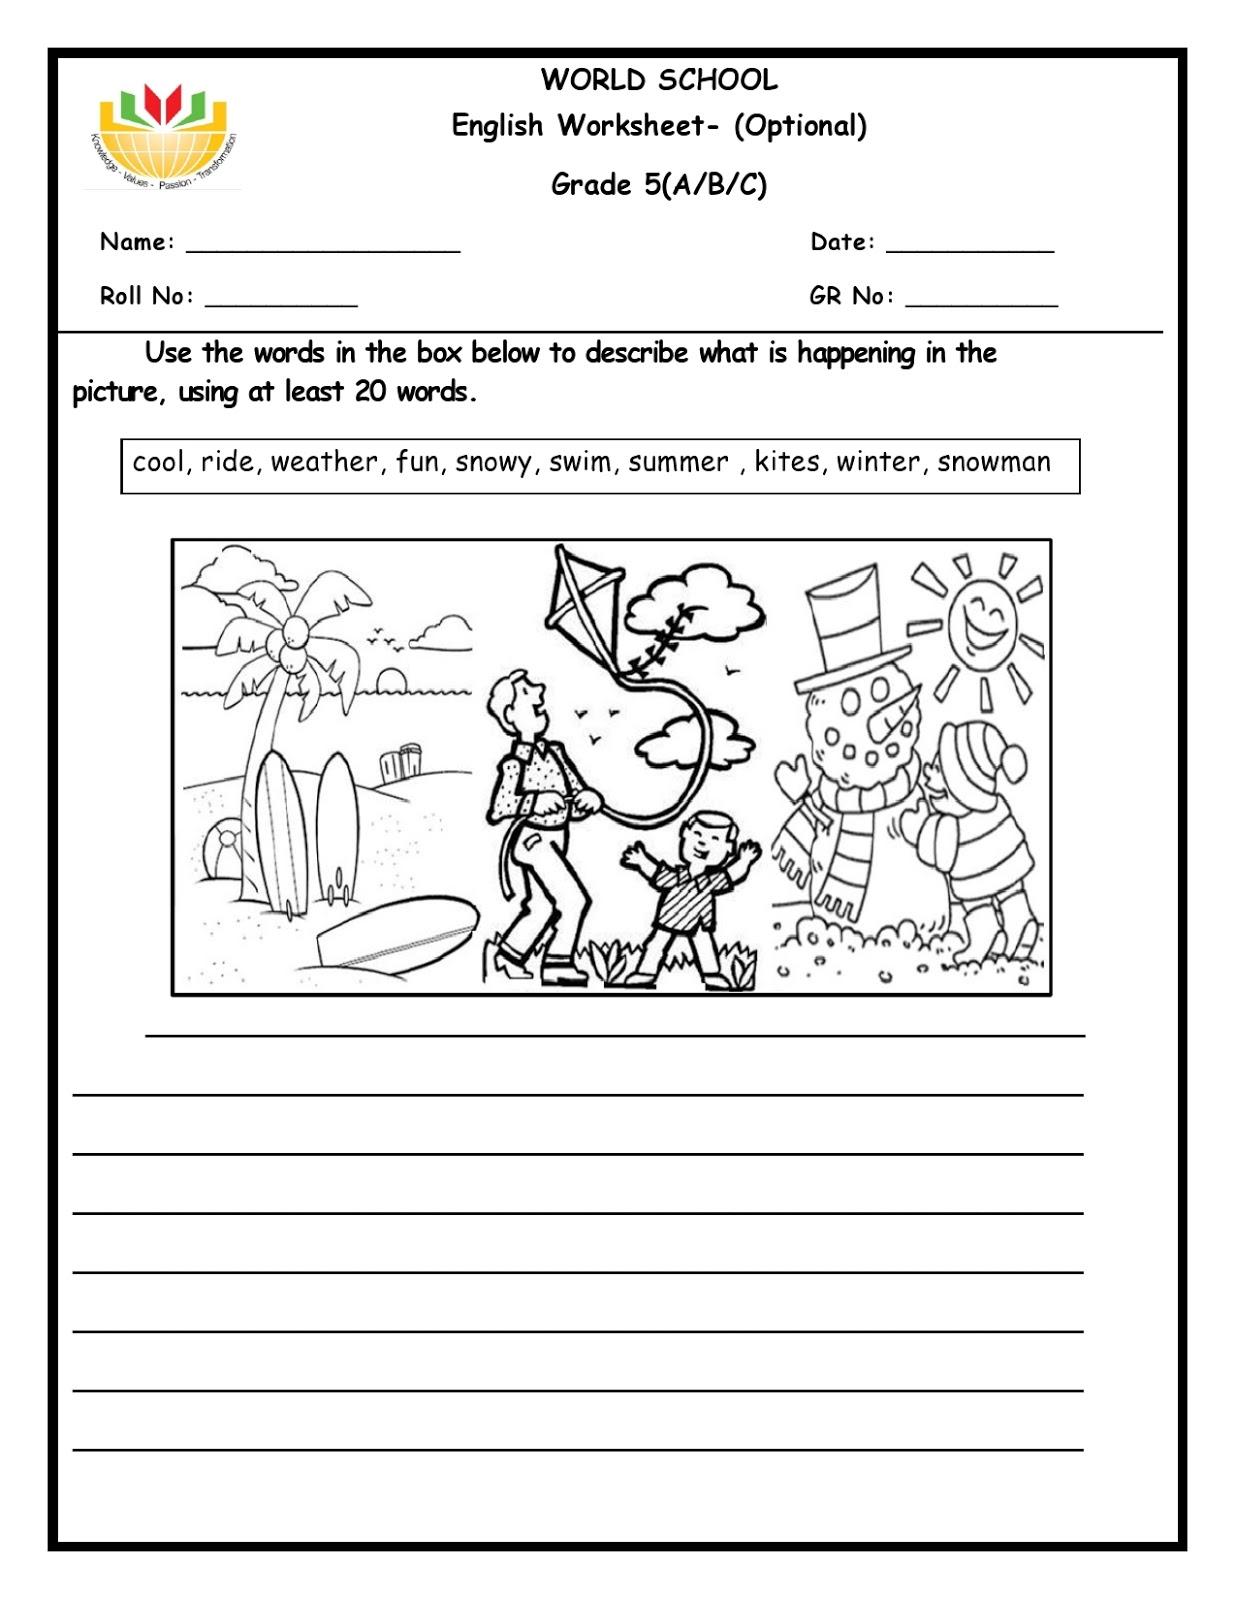 hight resolution of WORLD SCHOOL OMAN: Homework for Grade 5 as on 03/03/2020